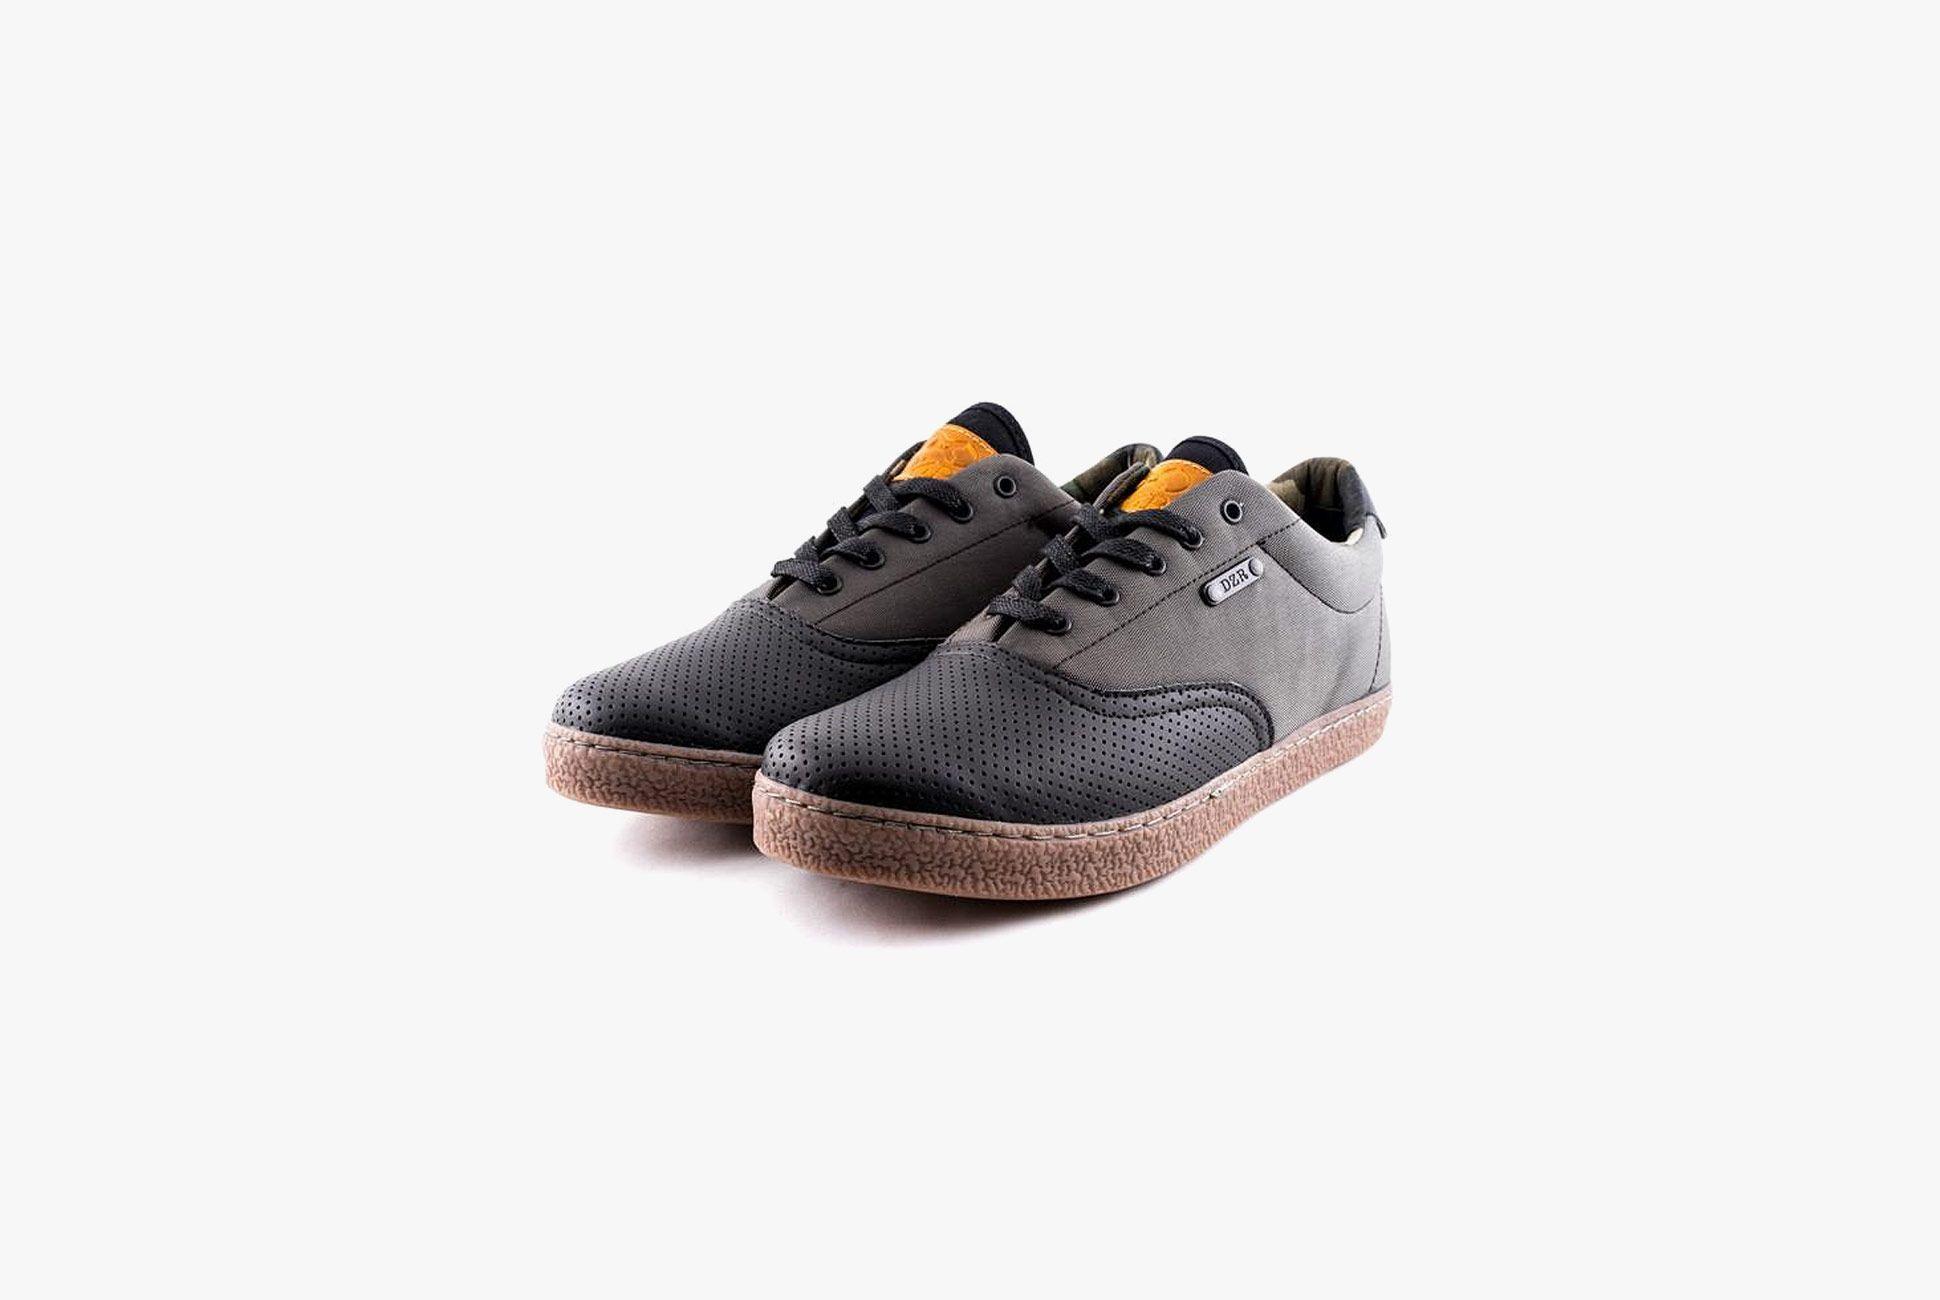 DZR-Shoes-gear-patrol-7